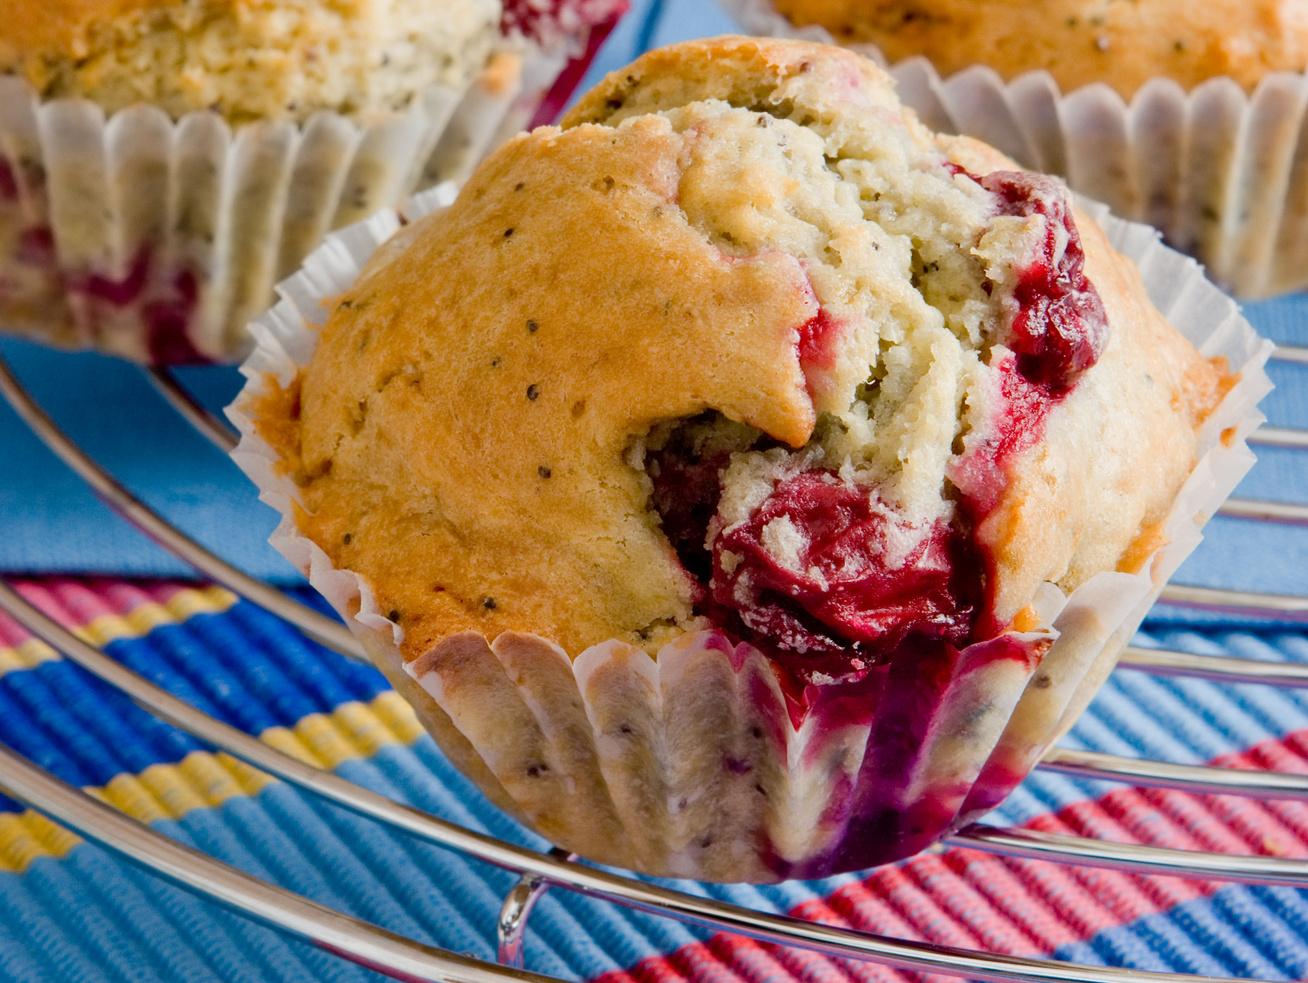 meggyes-makos muffin receptje